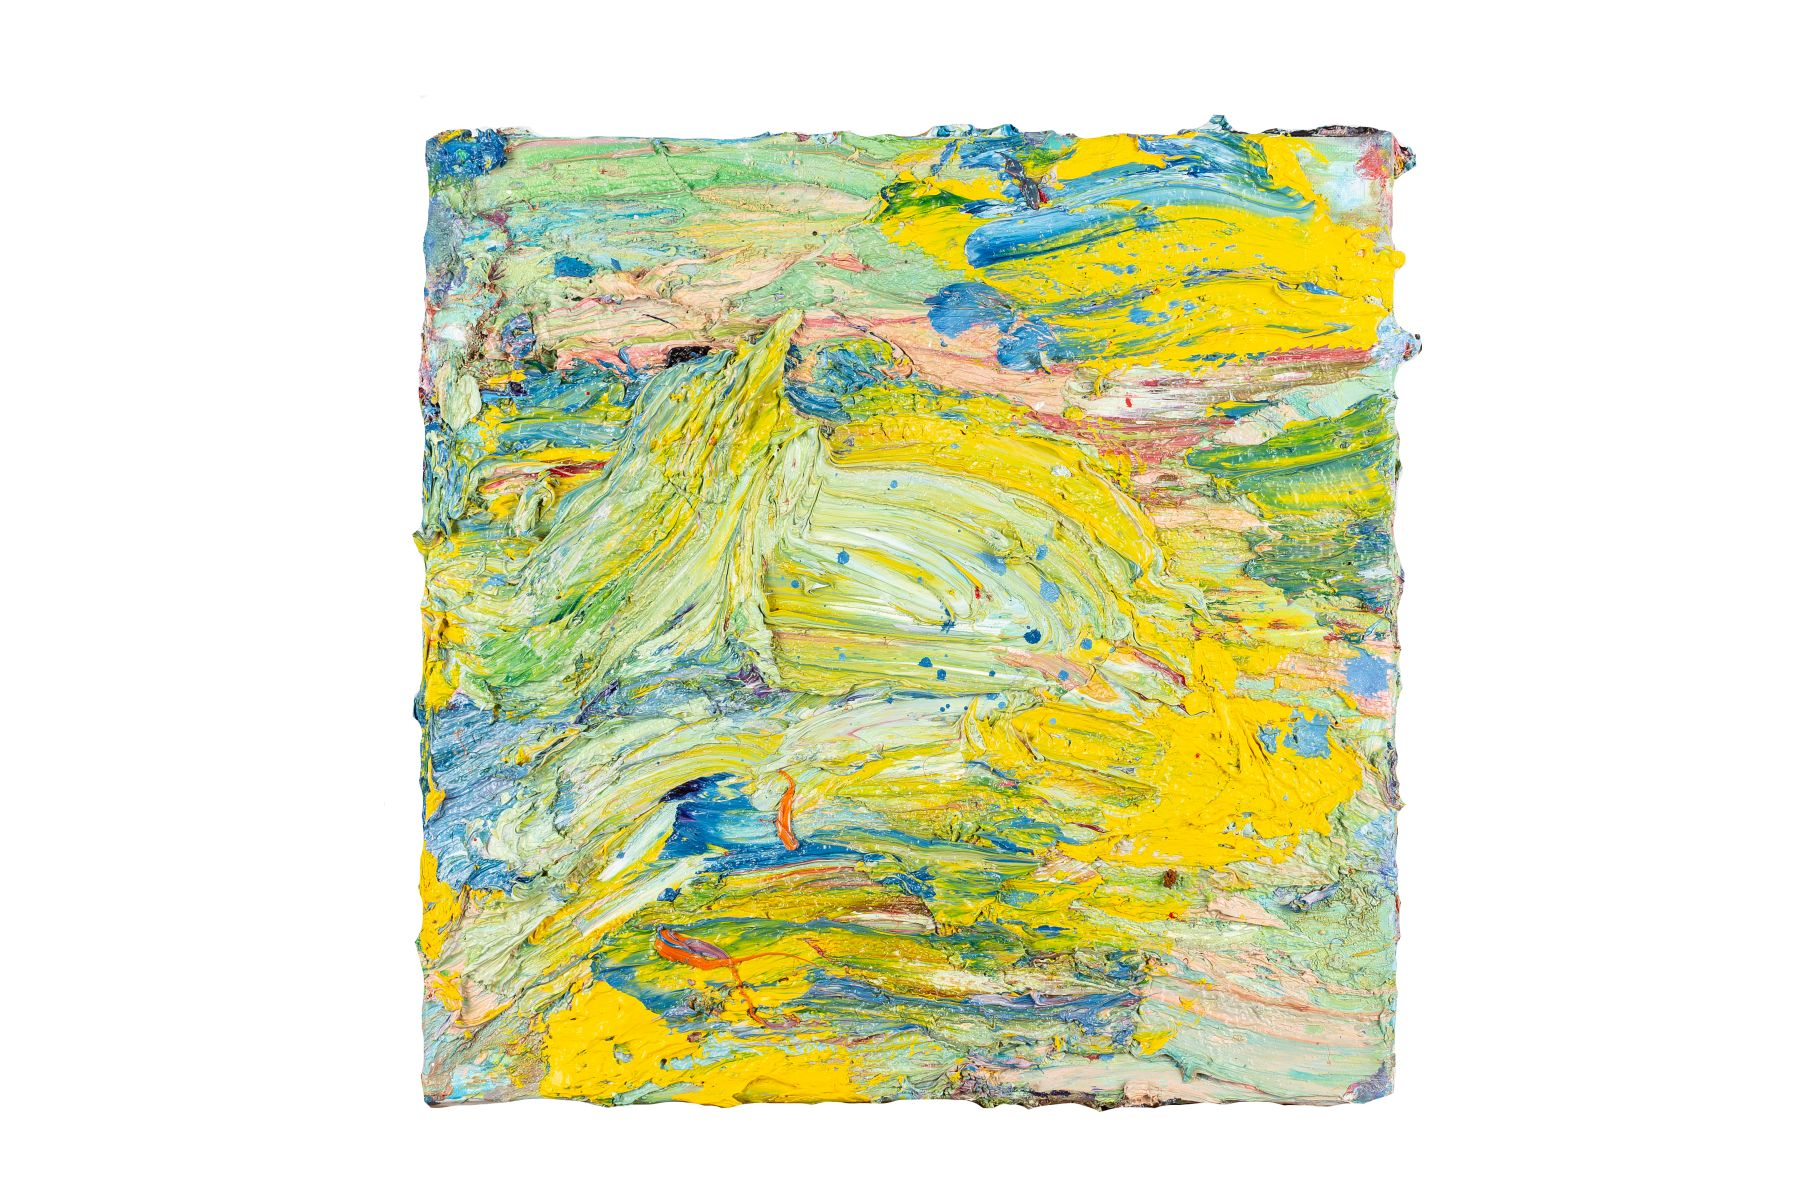 "#64 Nikolaus Moser (1956), ""Small Landscape 22"" | Nikolaus Moser( 1956), ""Kleine Landschaft 22"" Image"